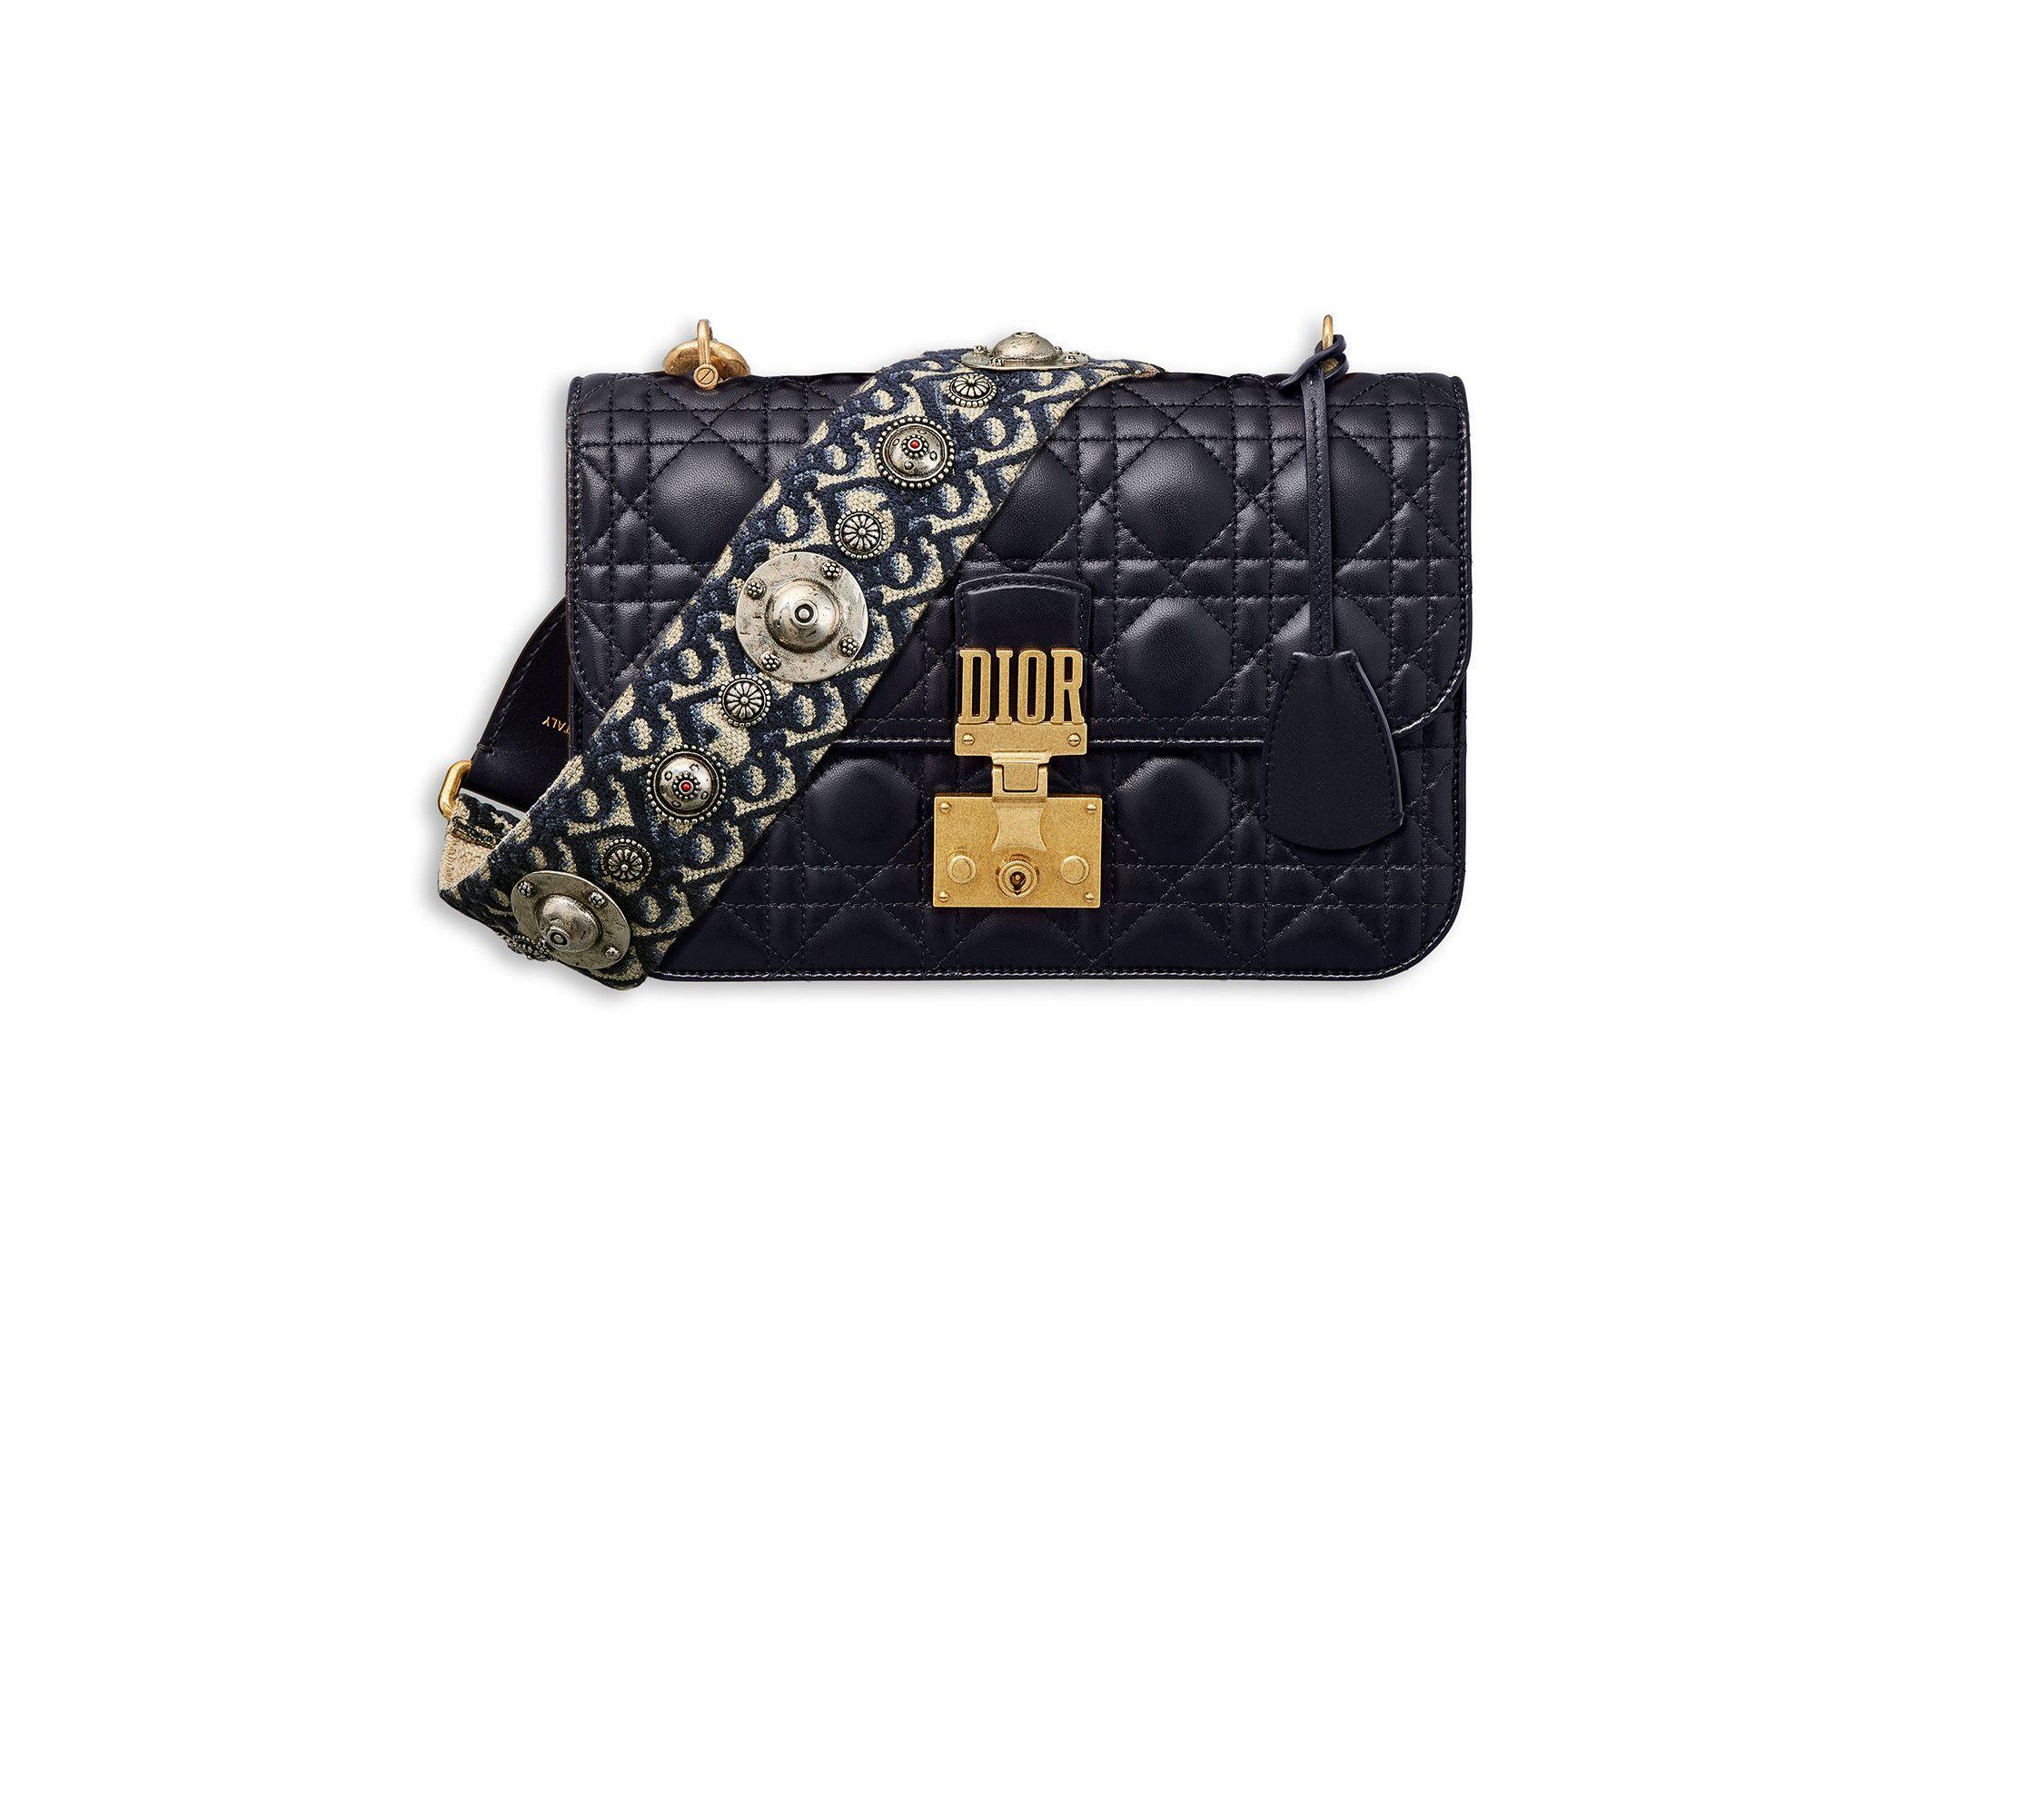 e269eb20dd36 Dioraddict flap bag in blue cannage lambskin with dior oblique shoulder  strap - Dior Dior  Shades